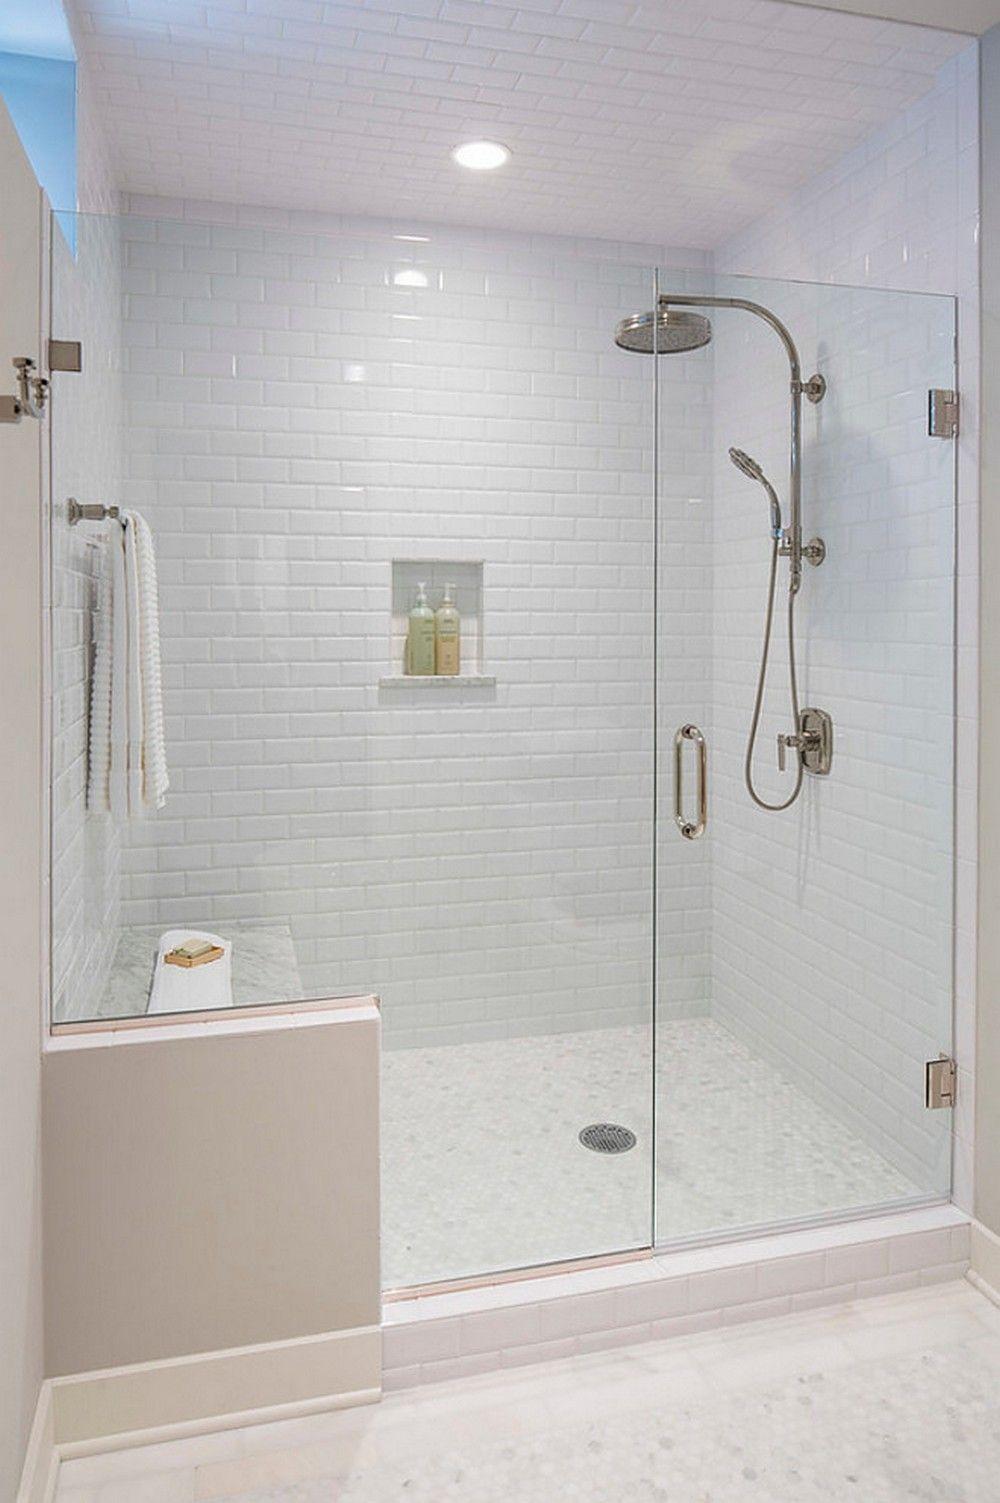 111 Fresh Subway Tiles Application for Your Bathroom | Subway tiles ...